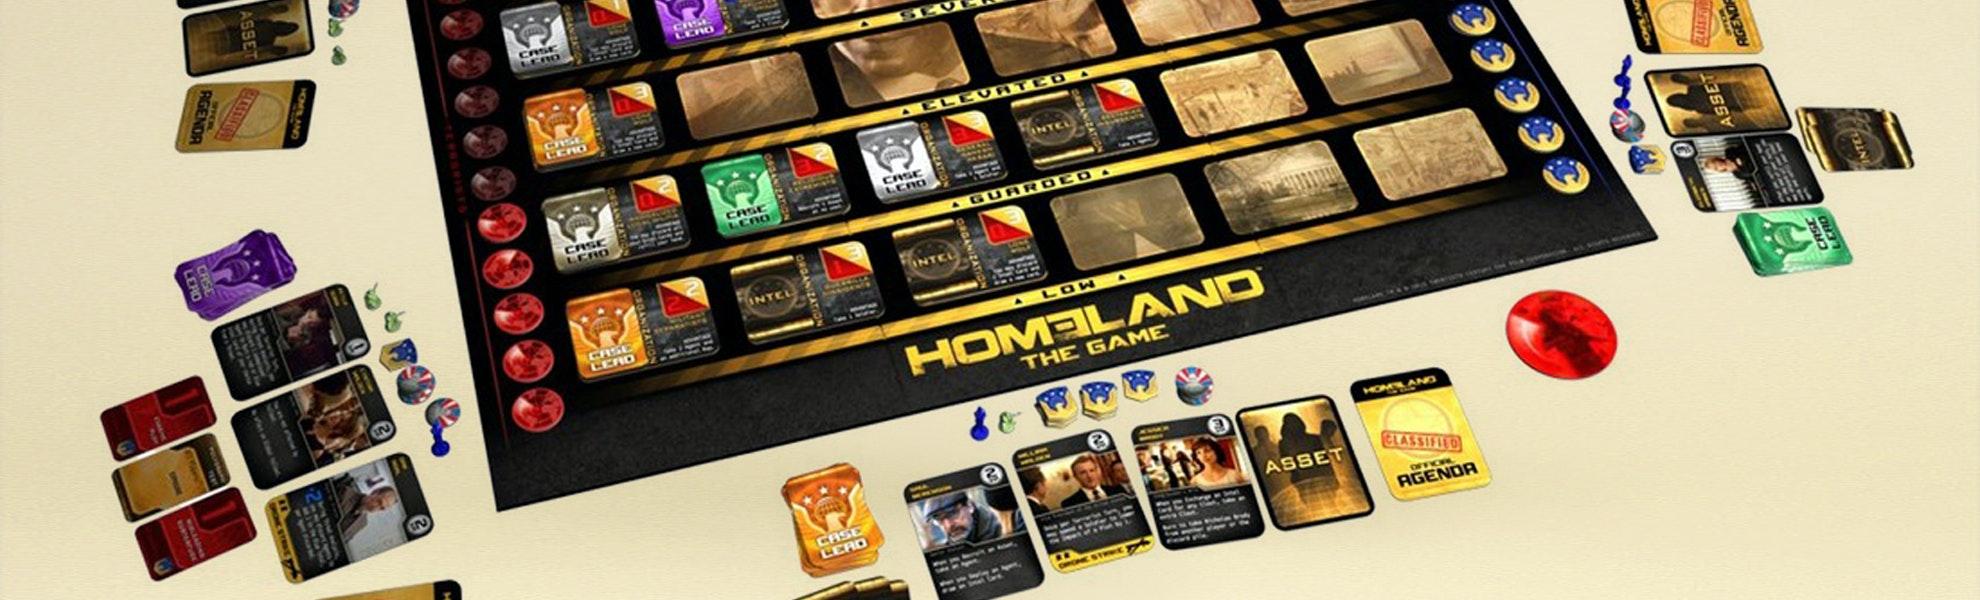 Homeland: The Game